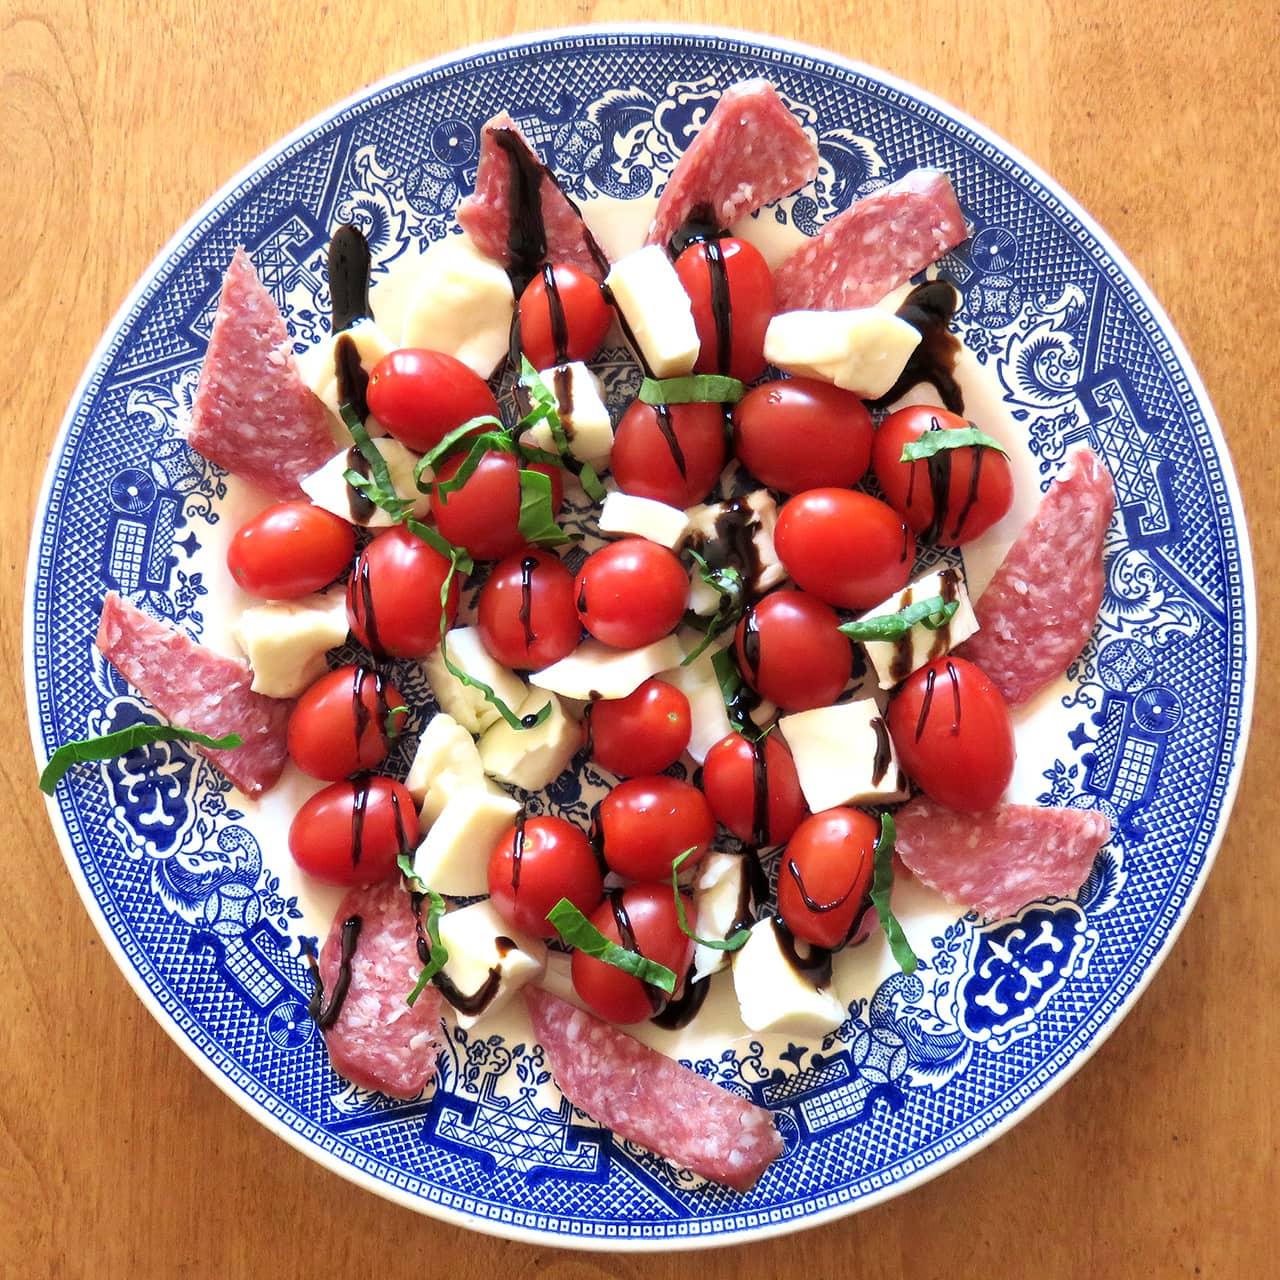 Tomato & Mozarella Salad Featuring Tusanini Balsamic Glaze